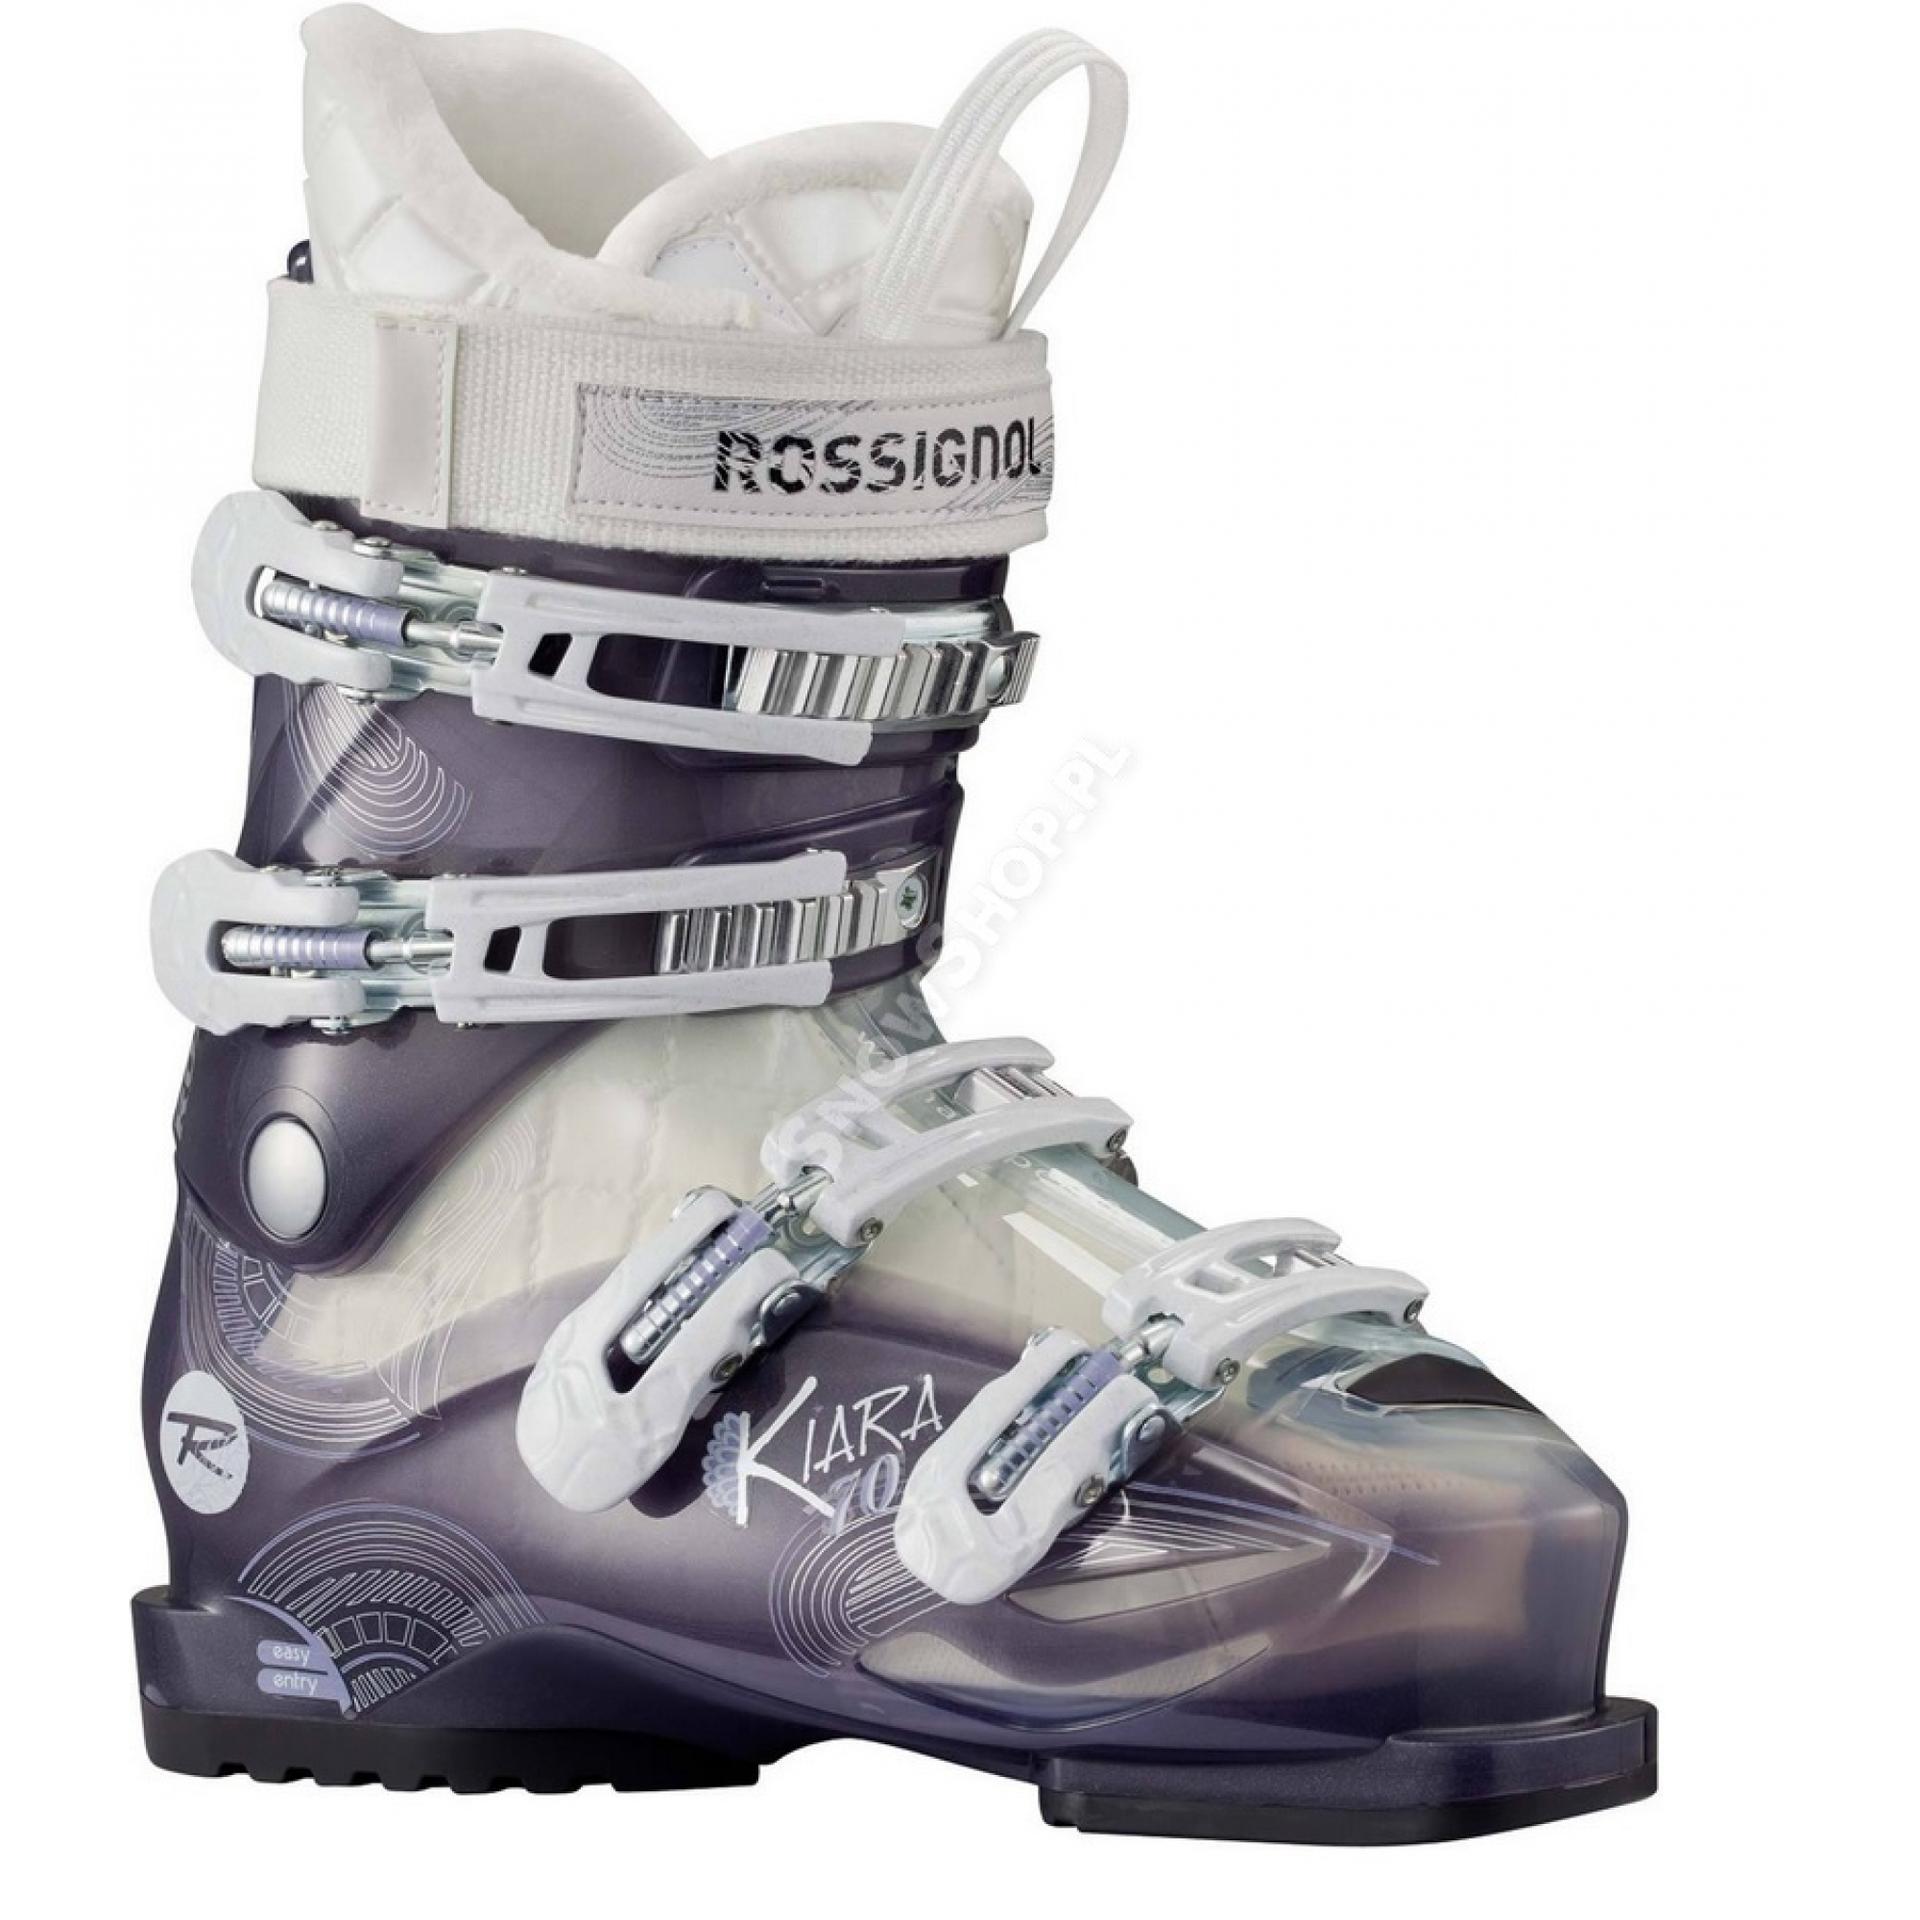 Buty narciarskie Rossignol Kiara Snesor